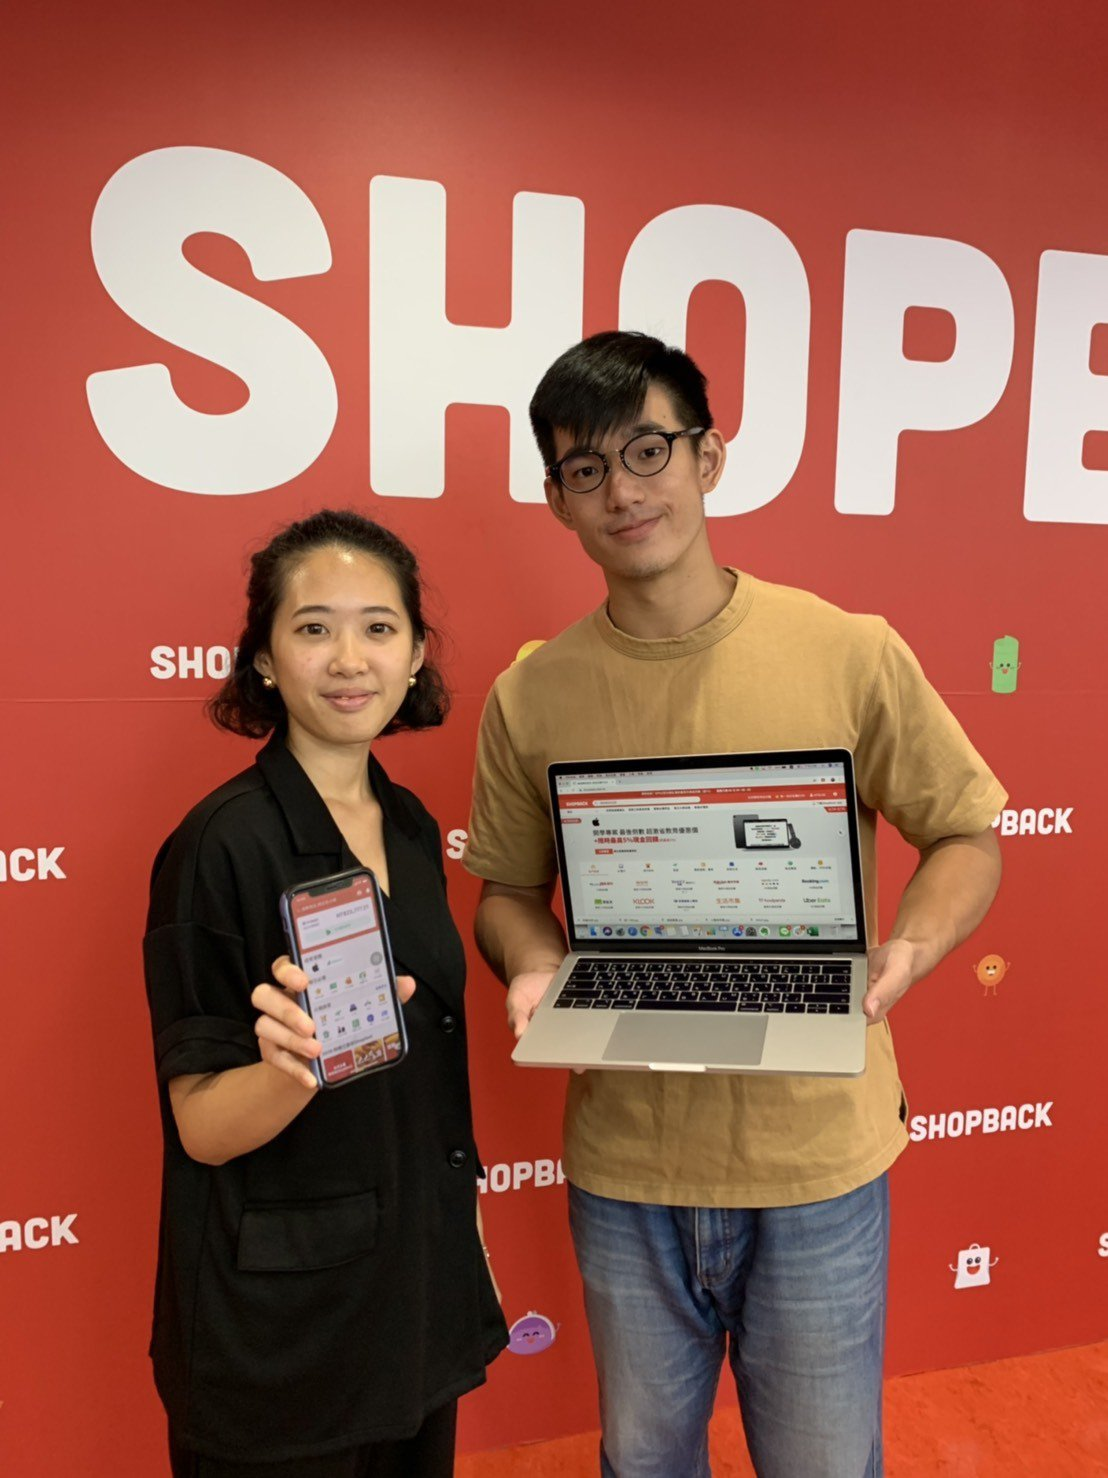 APPLE官方網站獨家與現金回饋網ShopBack合作,9月24日至9月26日限...